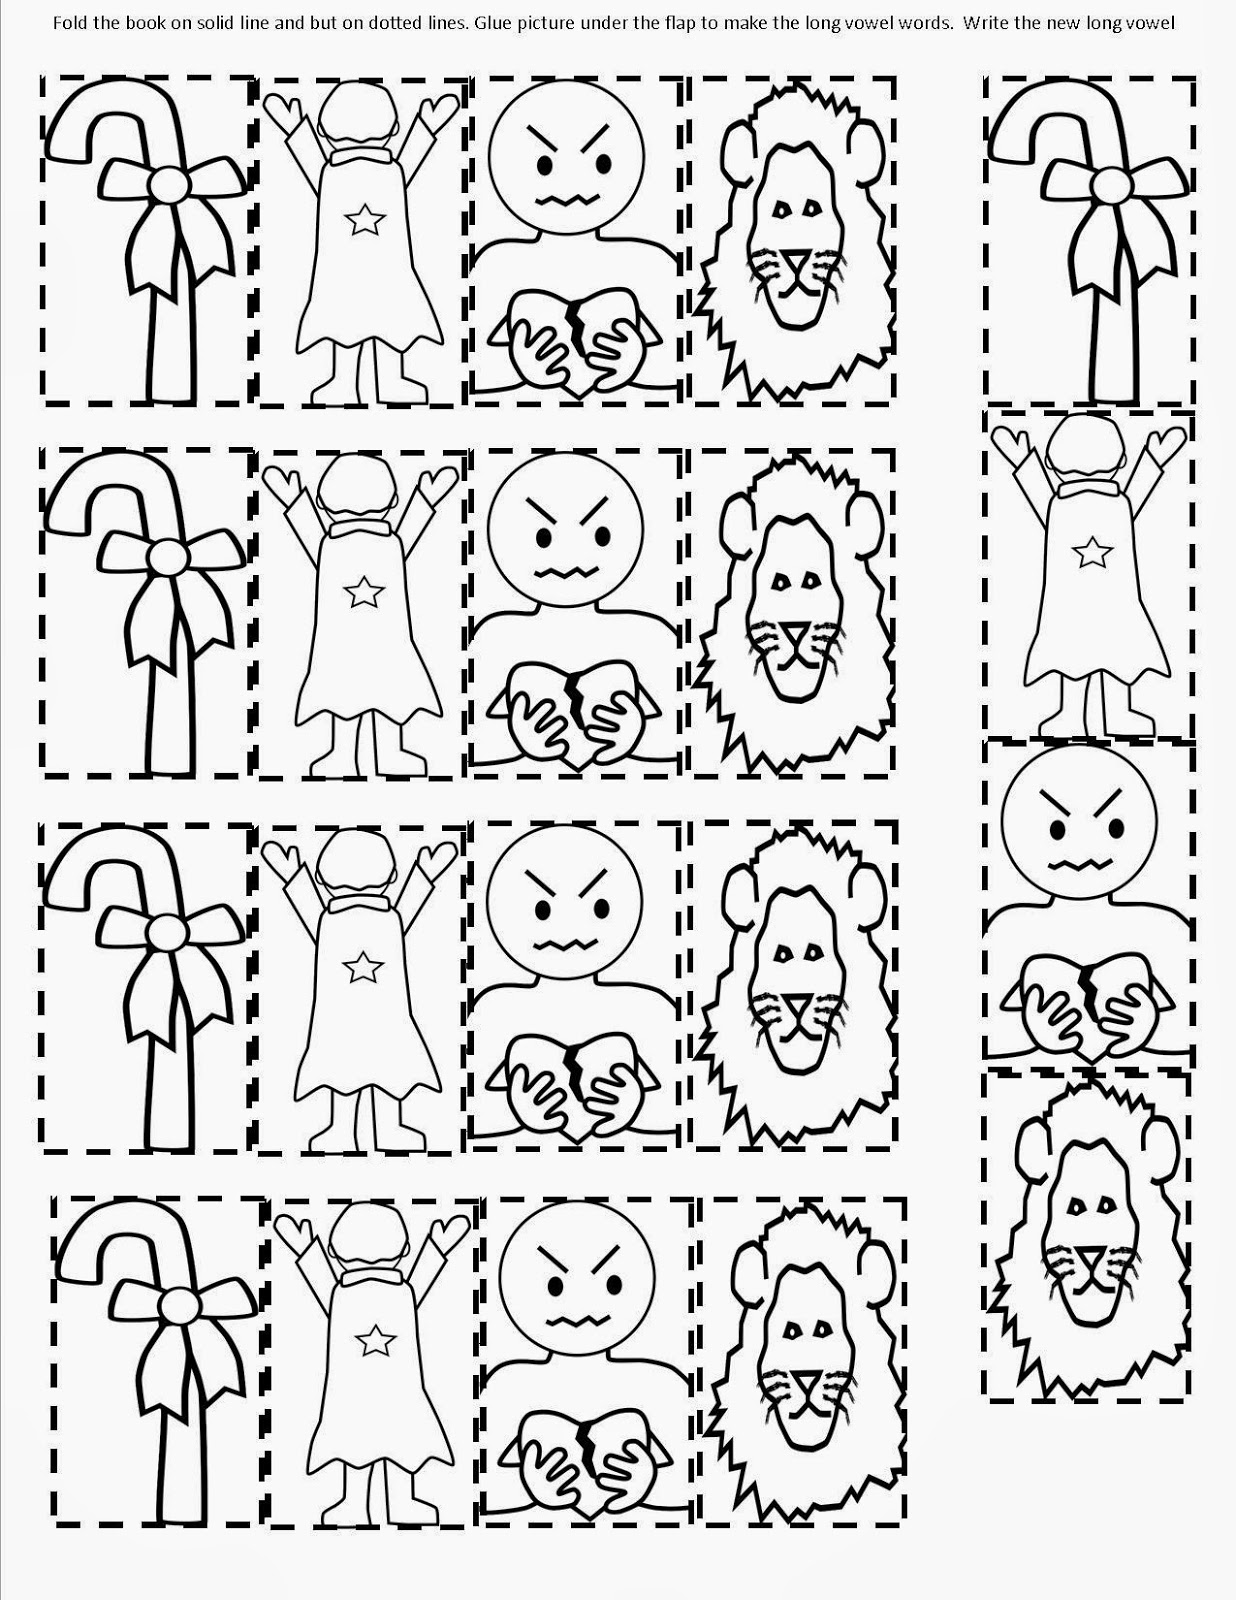 Long vowel coloring sheet - Long Vowel Coloring Sheet Students Make A Flip Book To Change The Short Vowel Word